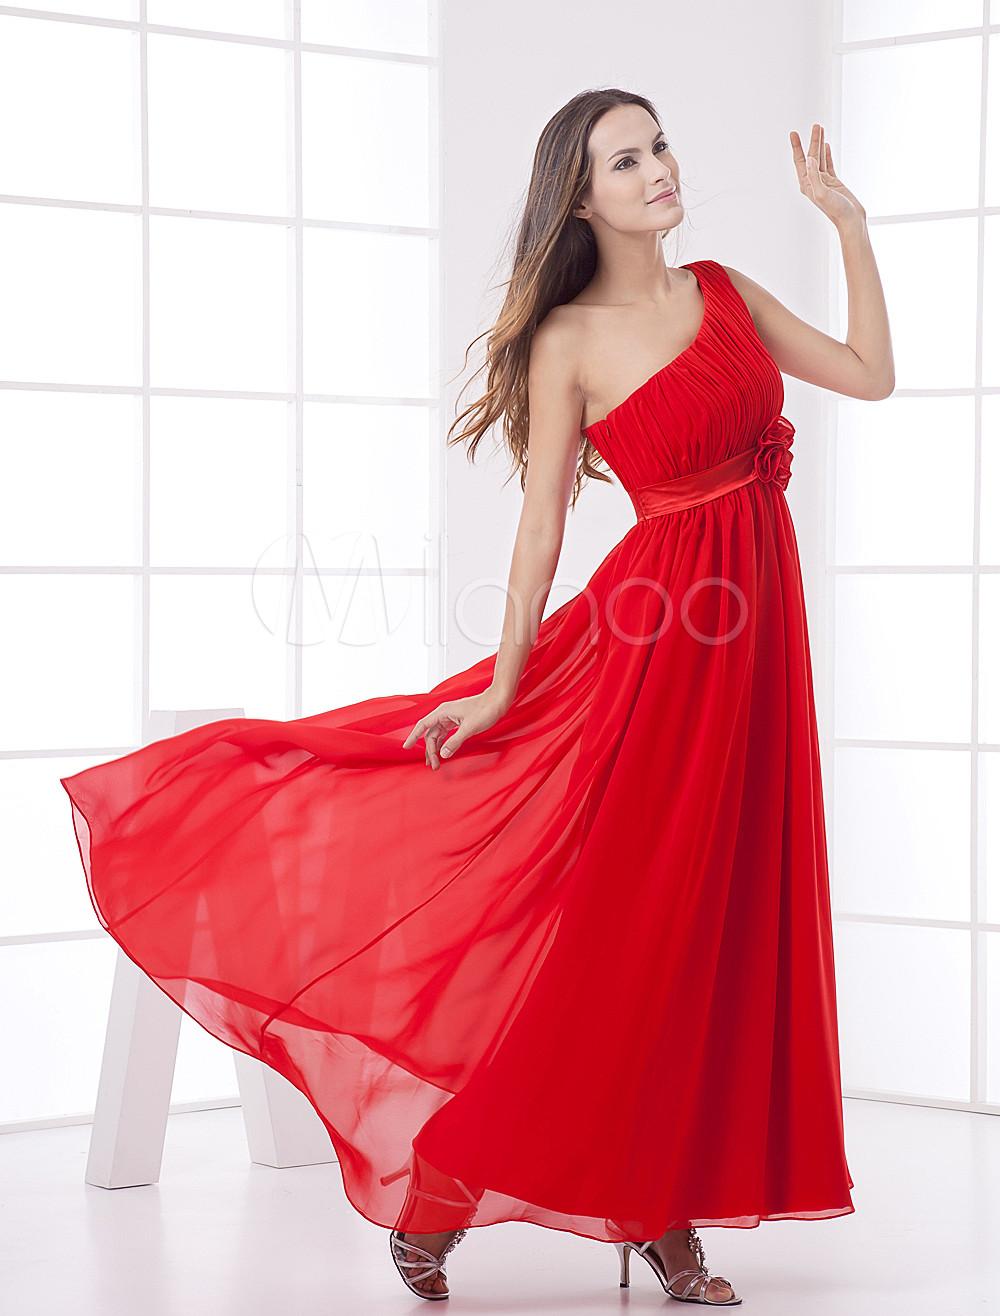 Red Elastic Silk Like Satin One Shoulder Empire Waist Evening Dress (Wedding Evening Dresses) photo